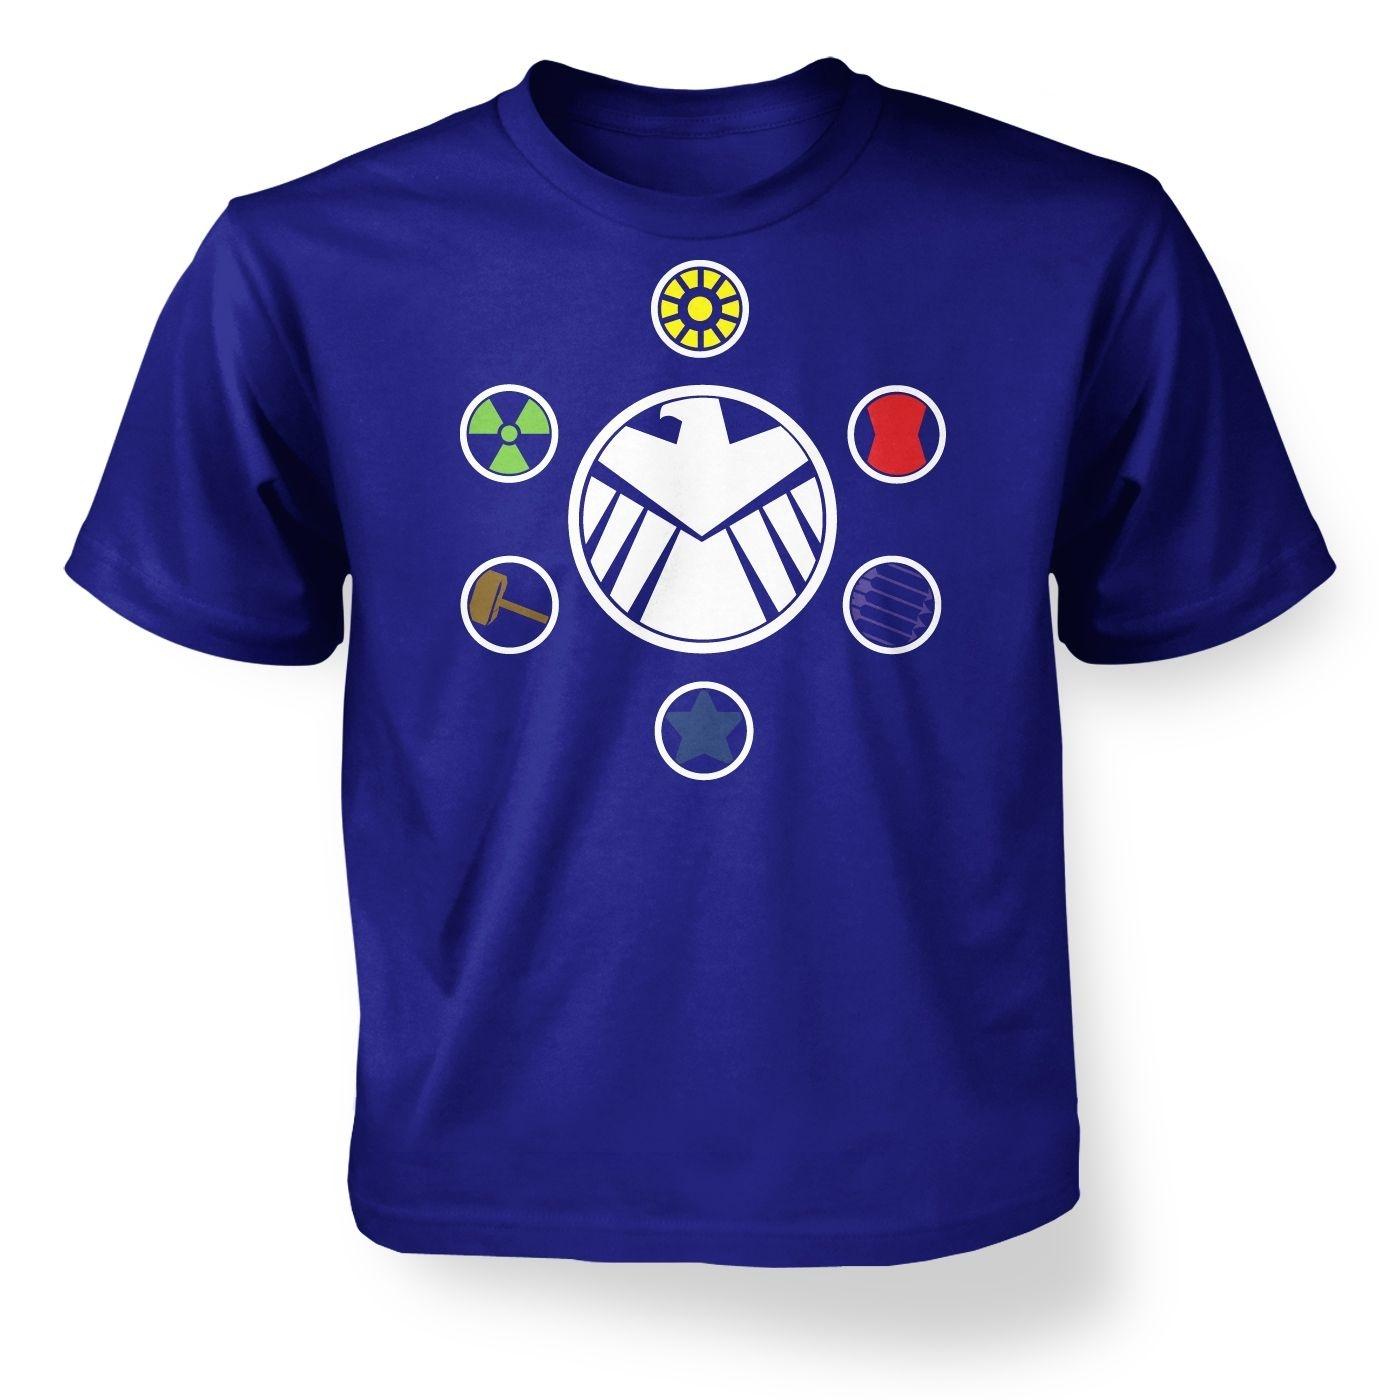 Avengers Unity kids' t-shirt